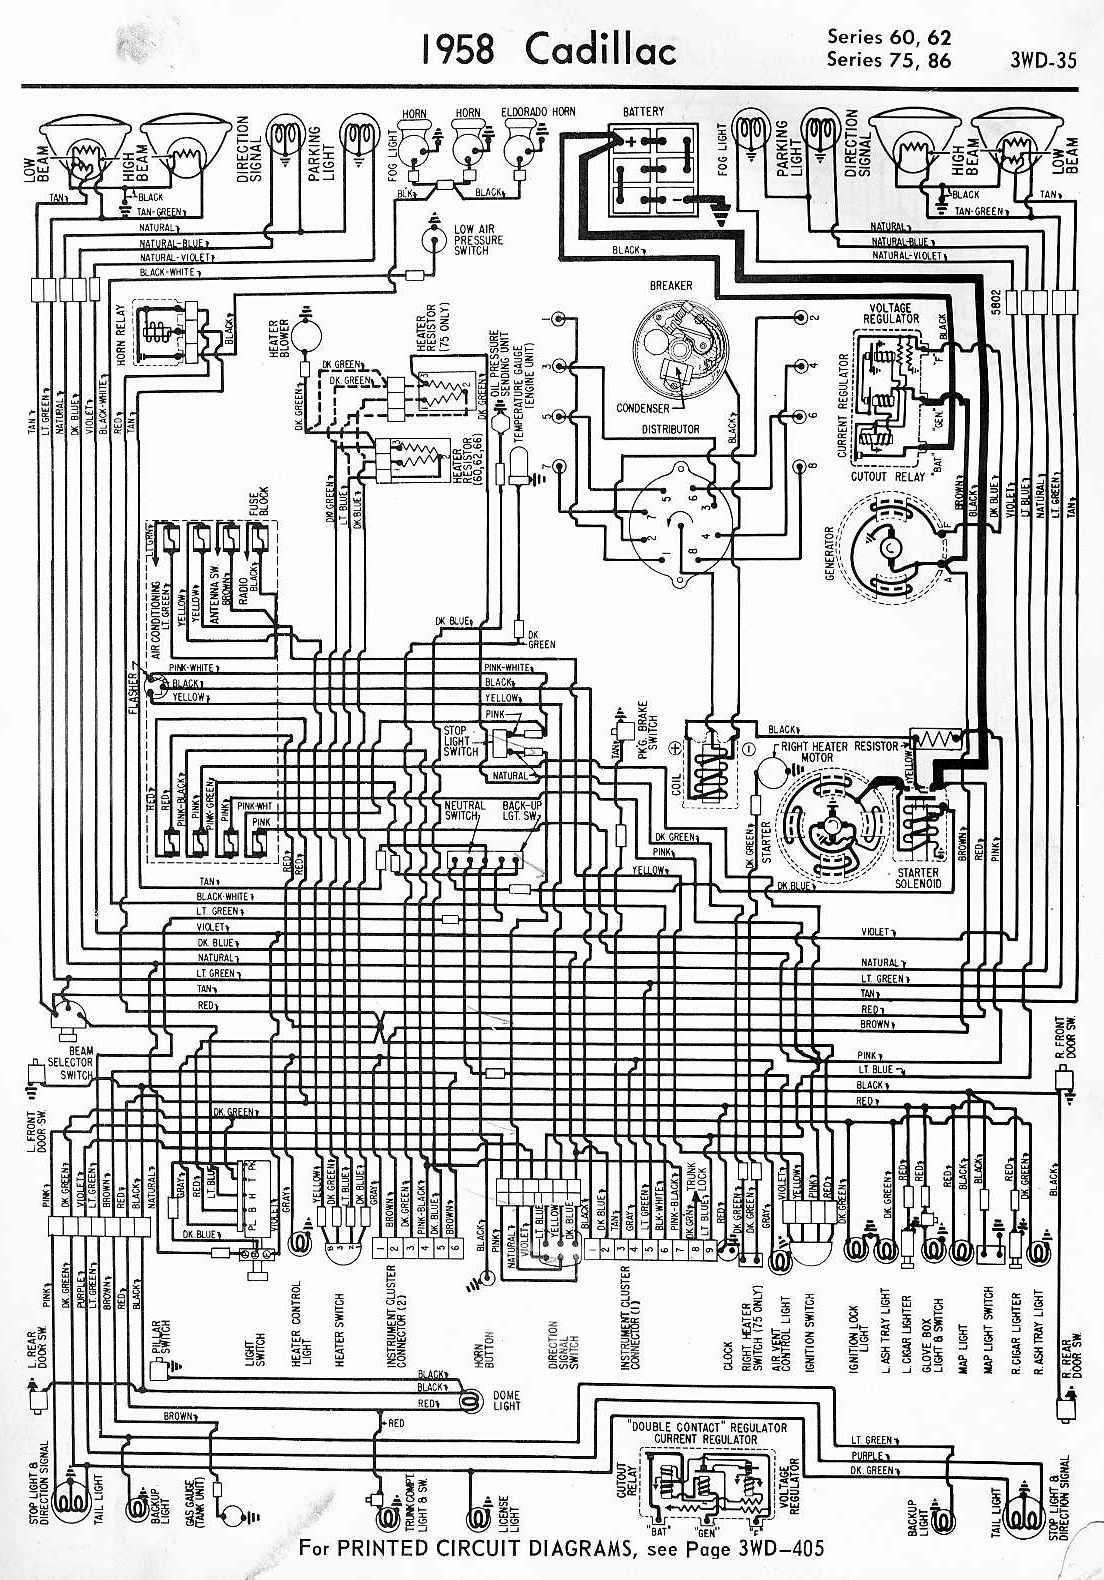 medium resolution of 1997 cadillac power seat wiring diagram simple wiring diagramscadillac power seat wiring wiring diagram todays gm